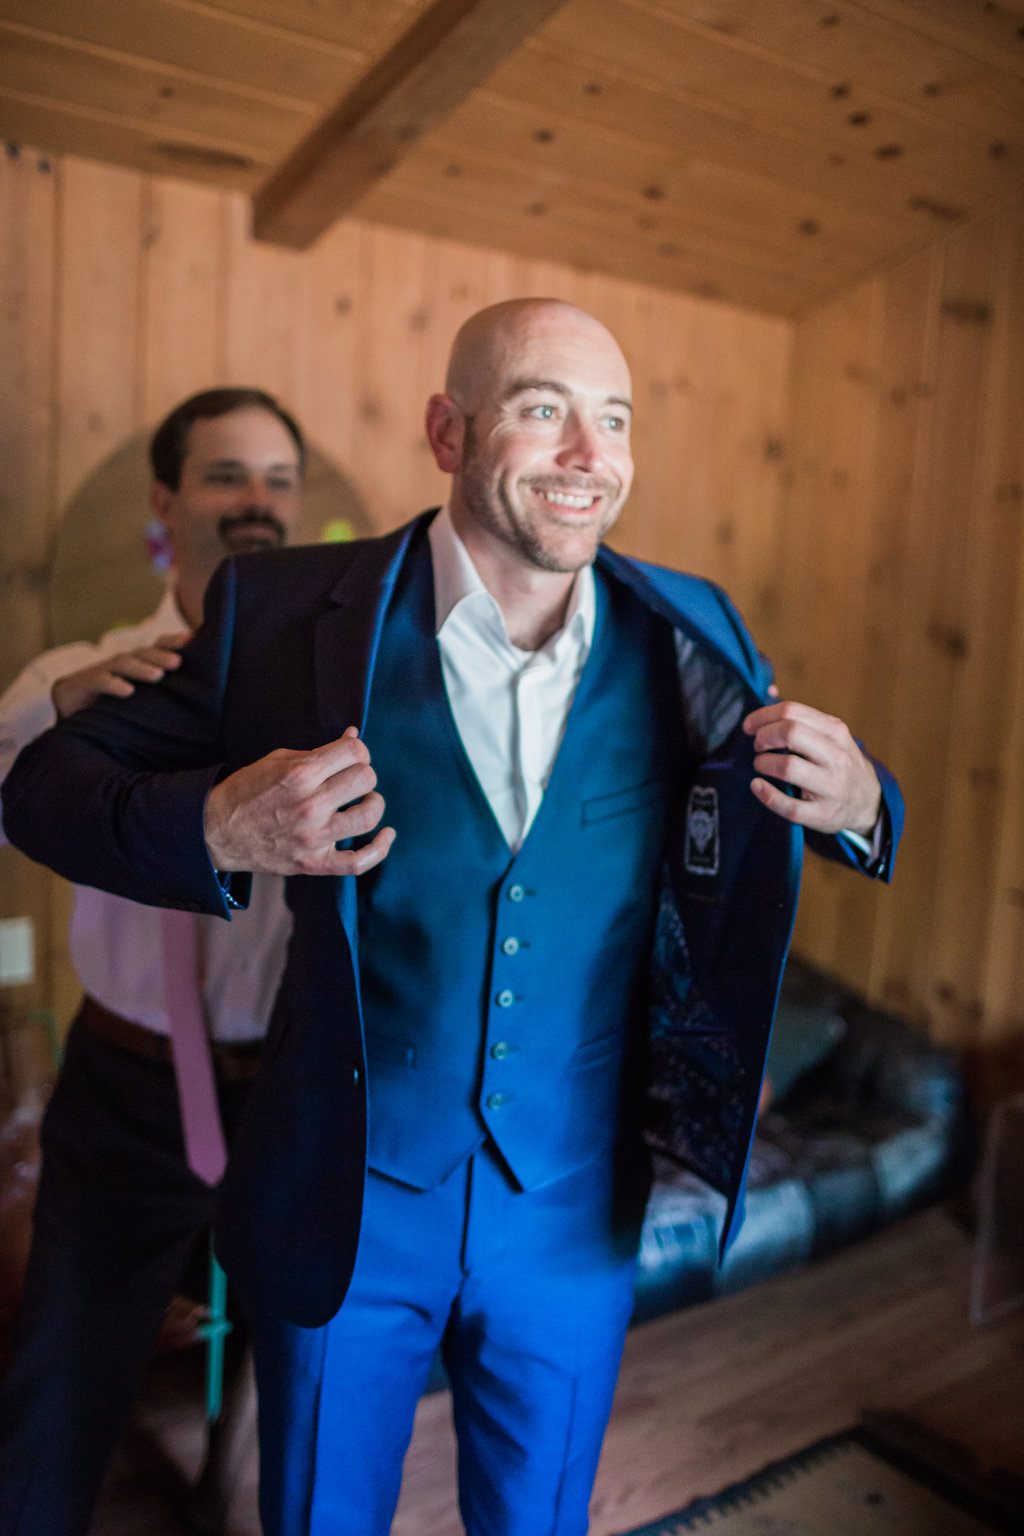 ted_baker_wedding_suit_ojai_wedding